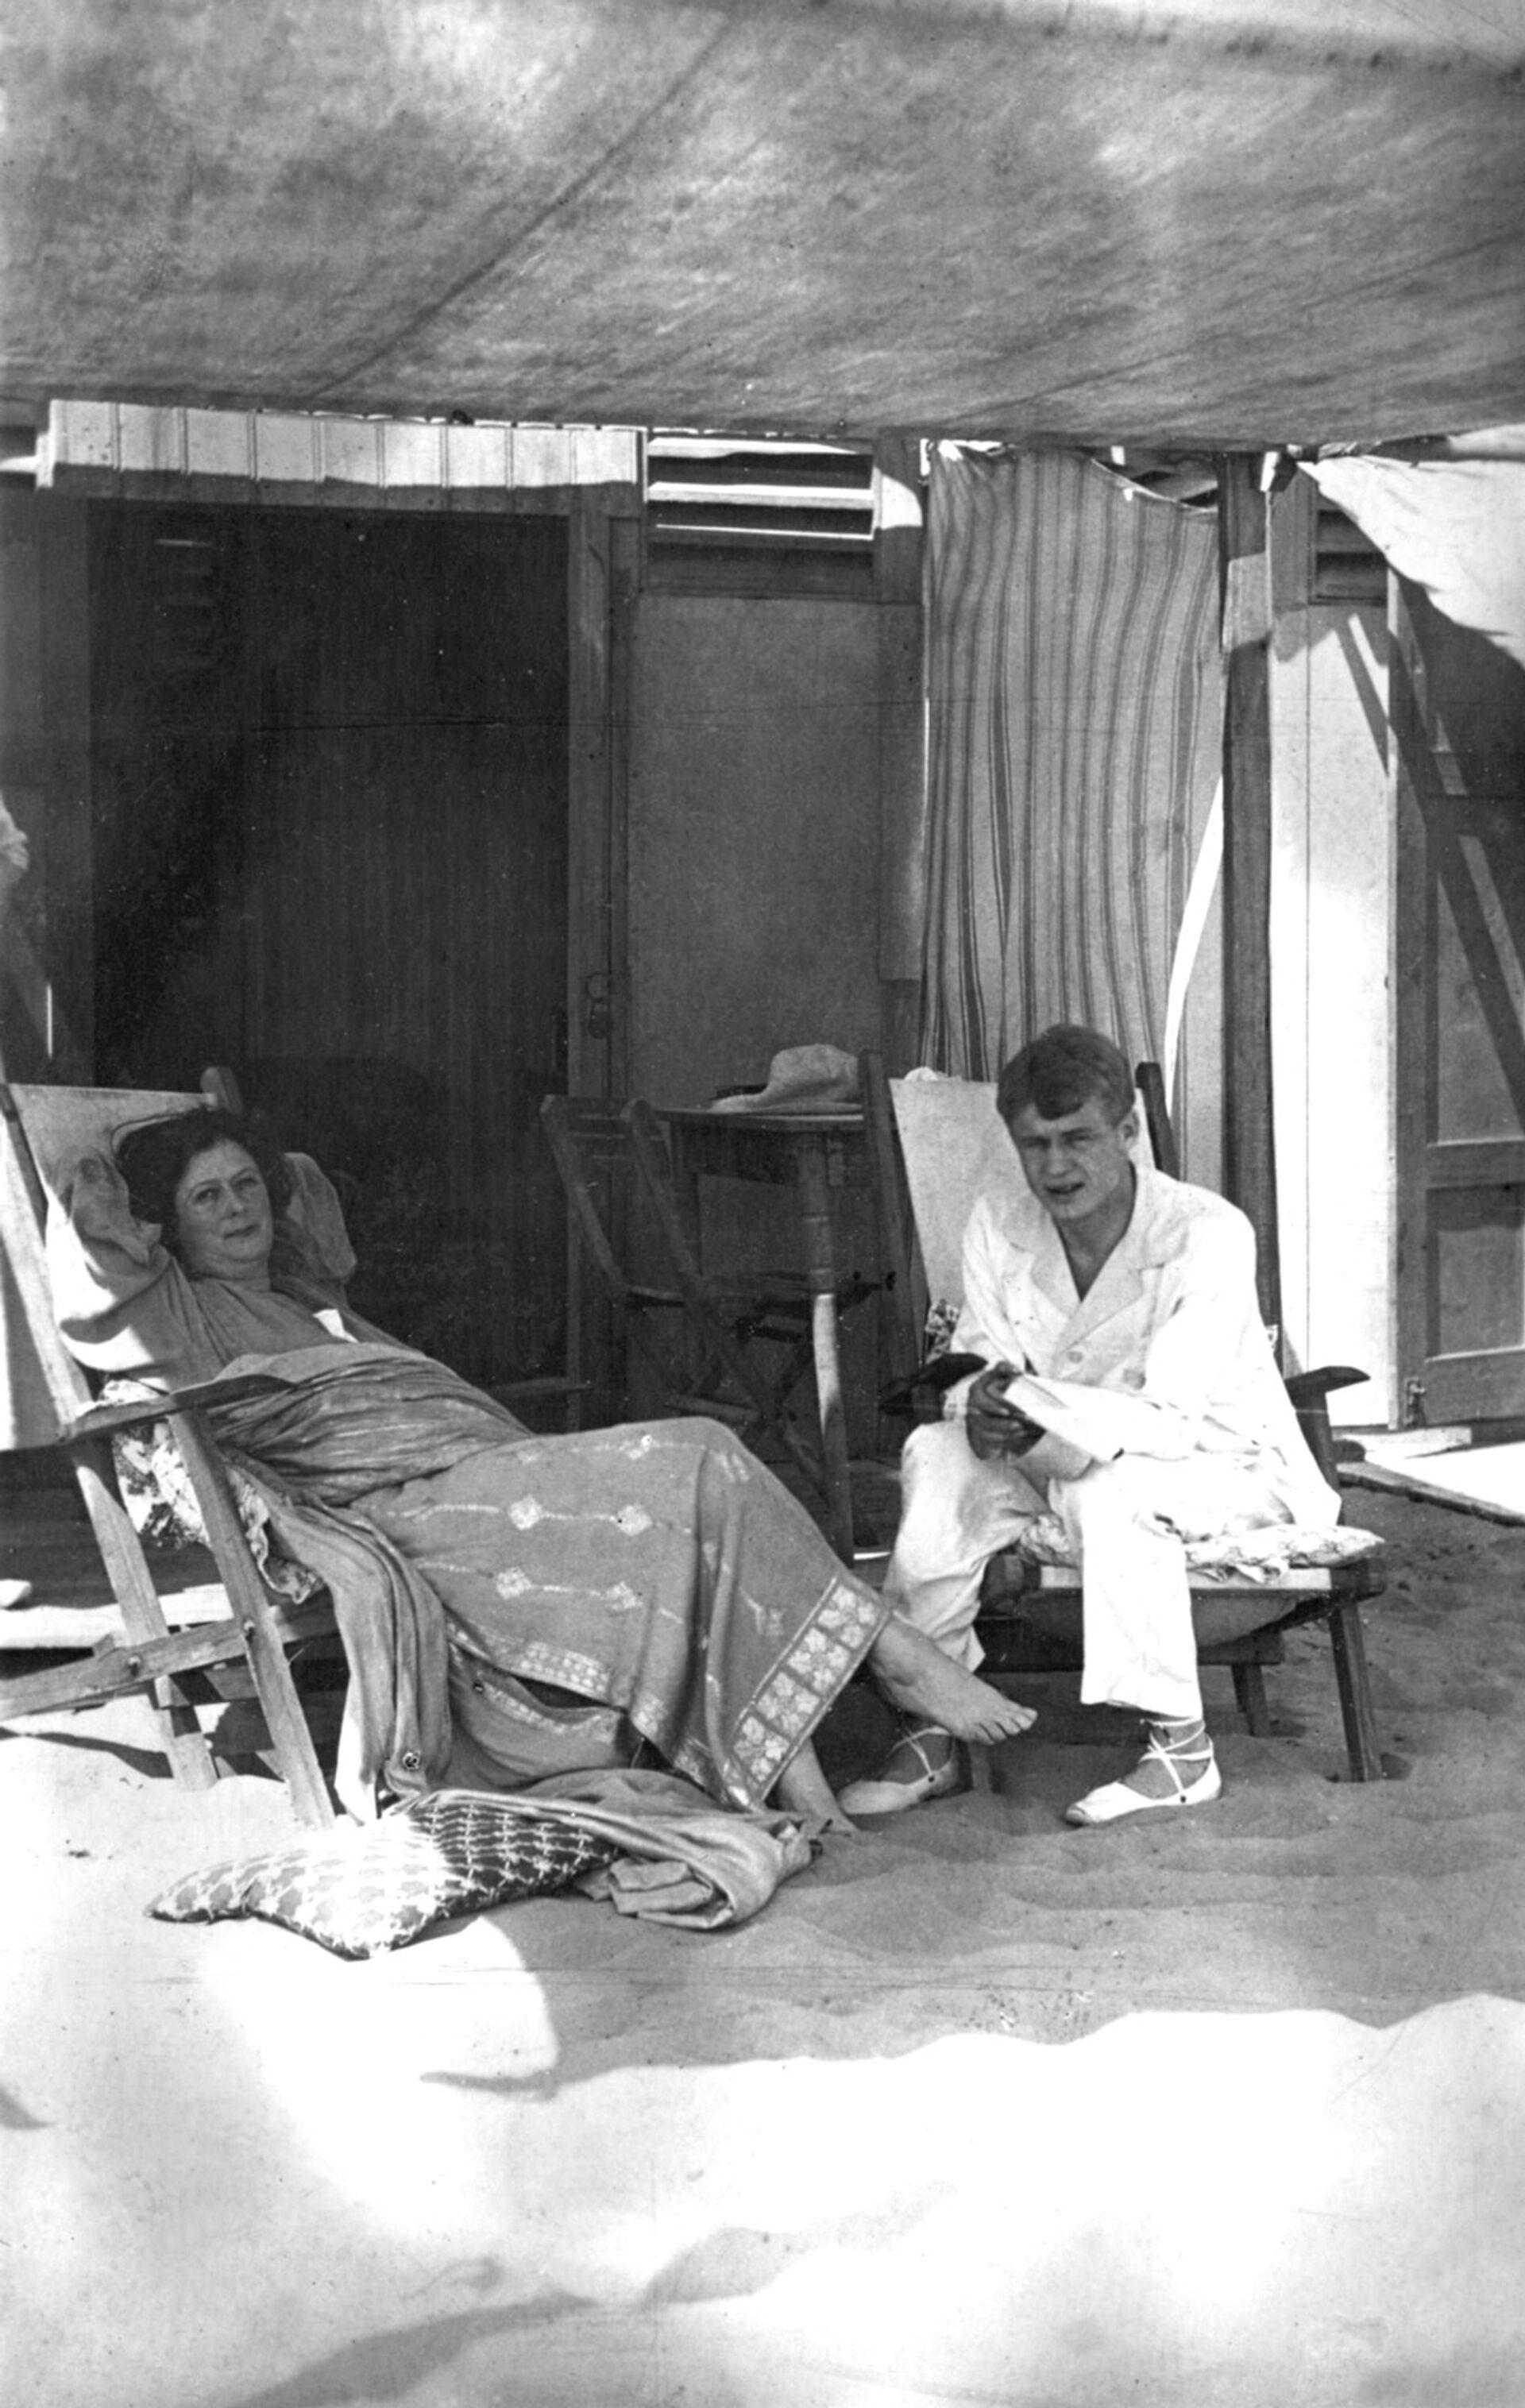 Сергей Есенин и Айседора Дункан на пляже при гостинице ExcelsiorPalaceHotel. Фото сделано 14 августа 1922 года - РИА Новости, 1920, 11.09.2020